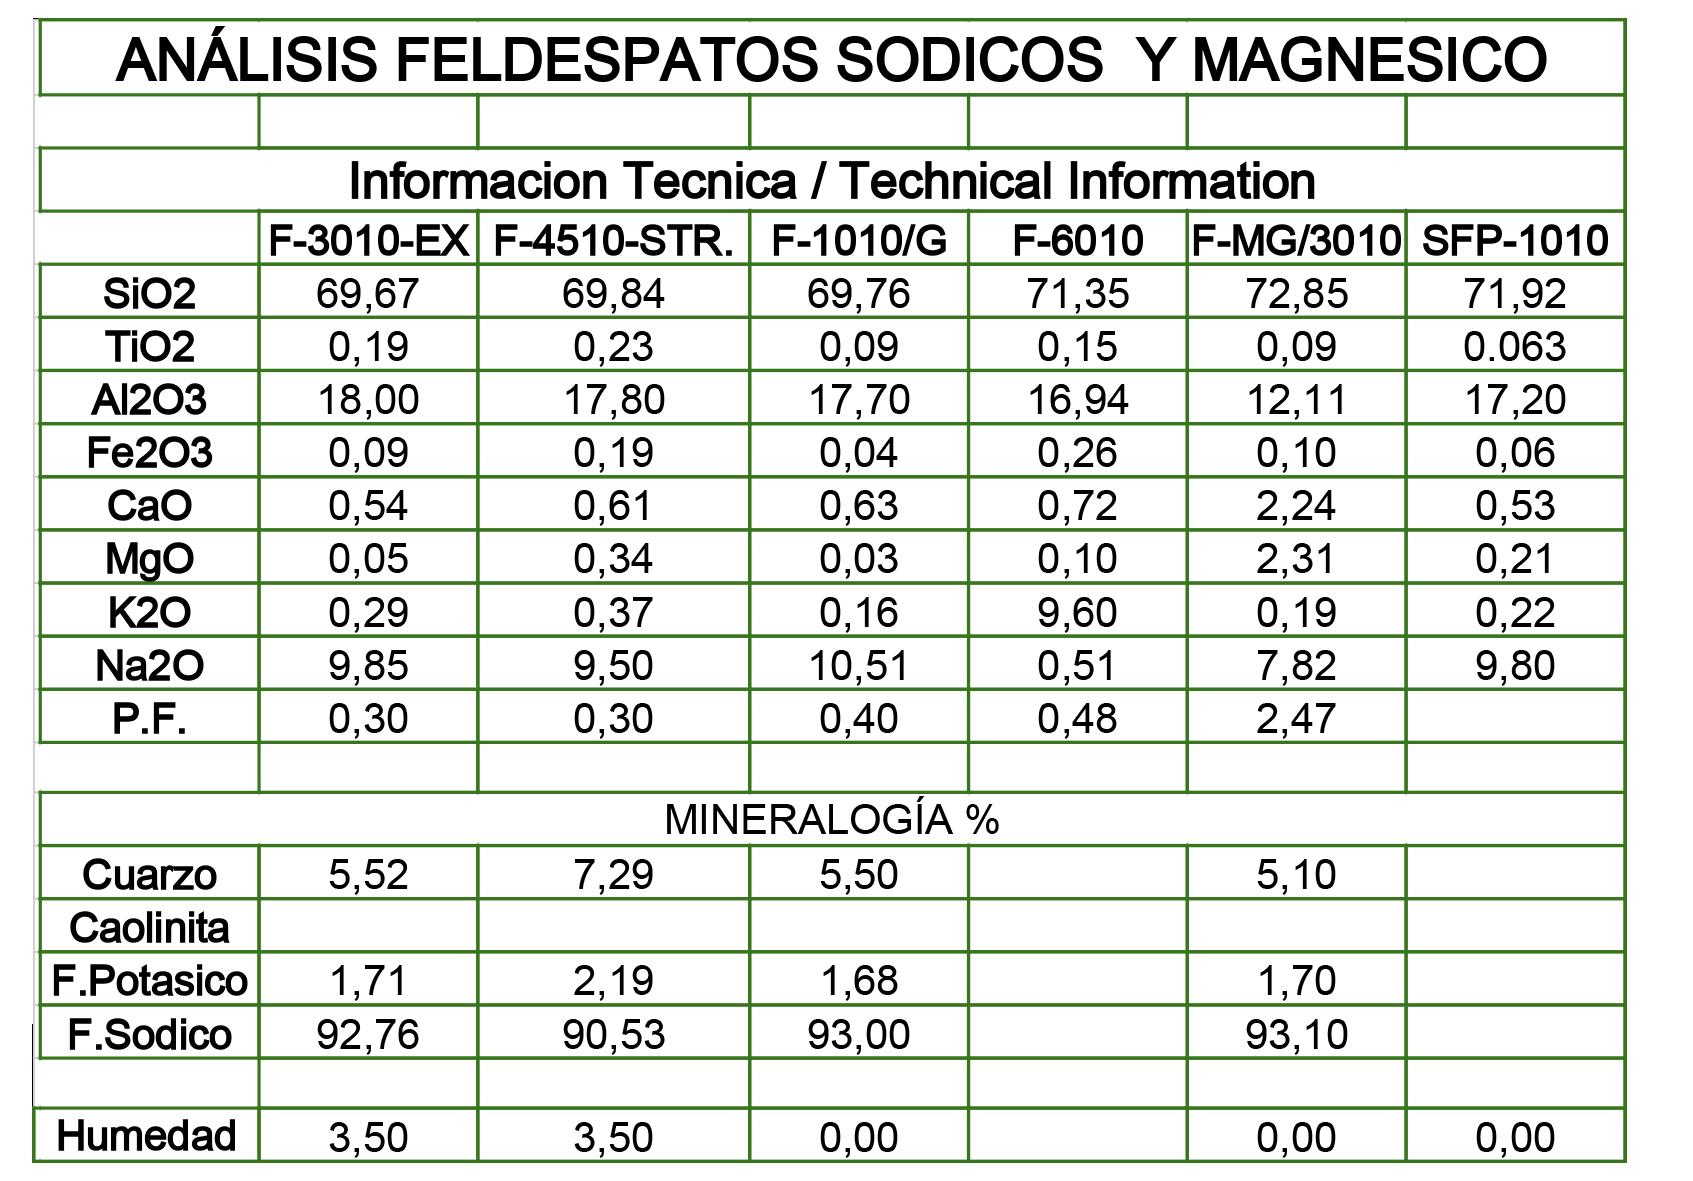 ANALISIS FELDESPATO SODICO 2